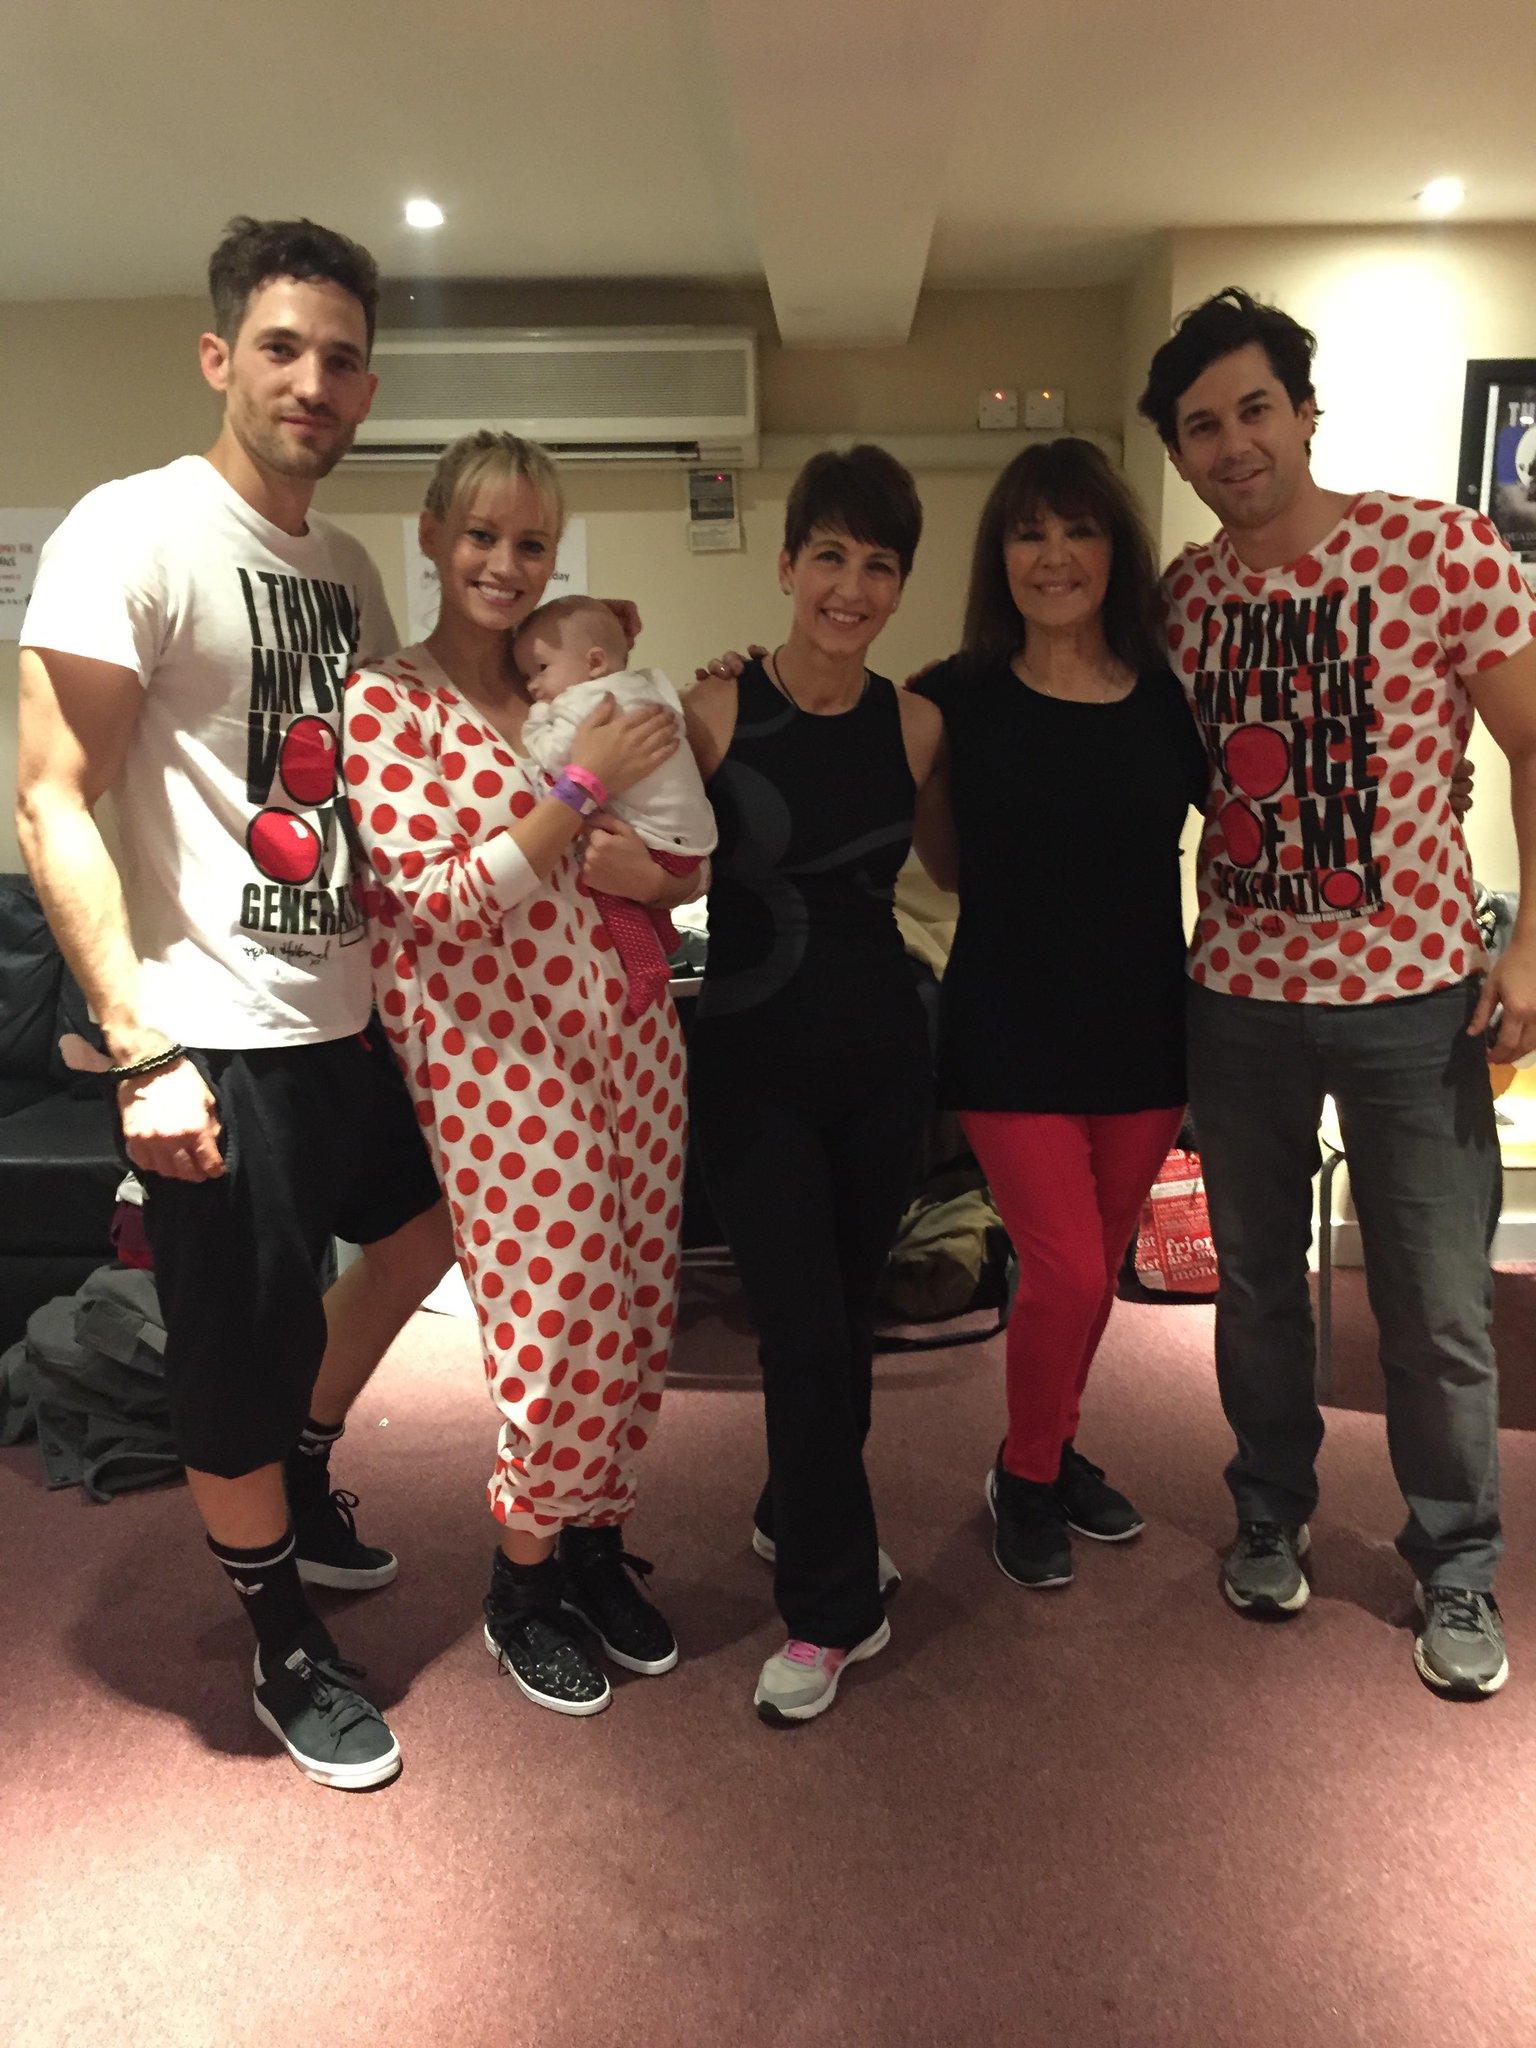 RT @arlenephillips: Regrouping @rednoseday @AnnaKennedy1 @KimberlyKWyatt @max_rogers #BabyWillow @ThatAdamGarcia #danceathon http://t.co/Iv…